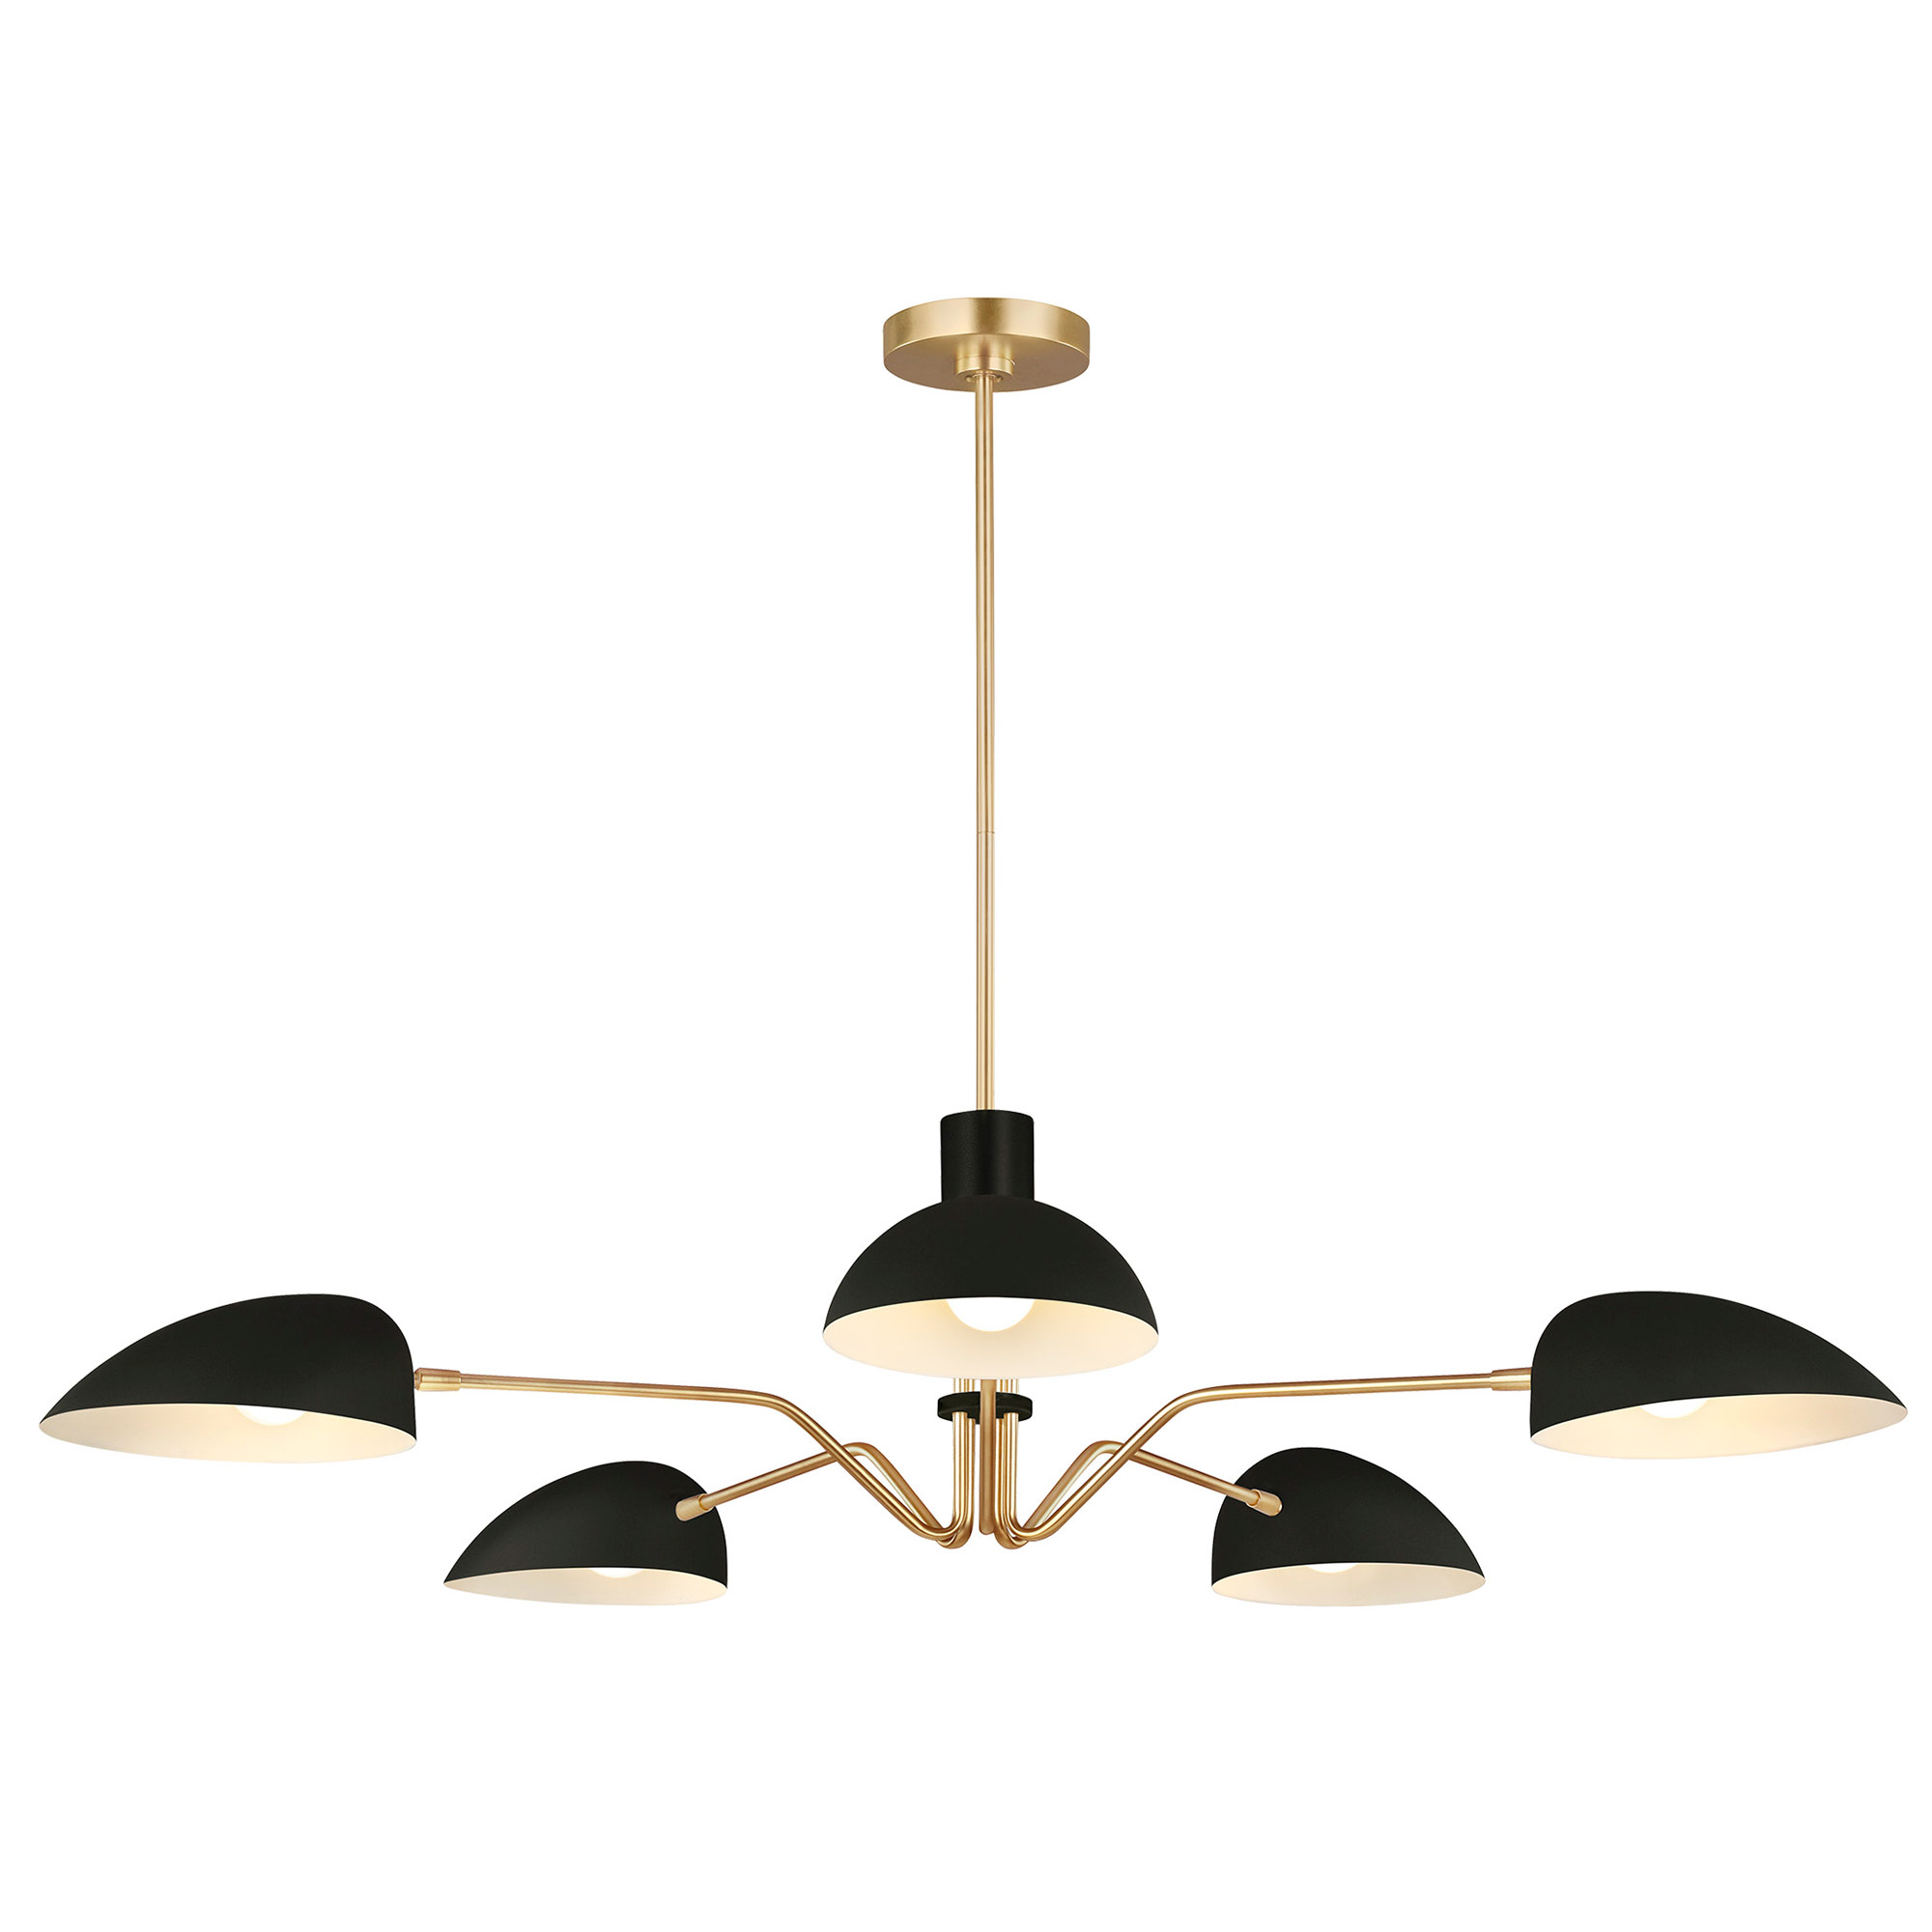 jane chandelier by ed ellen degeneres ec1025mbk